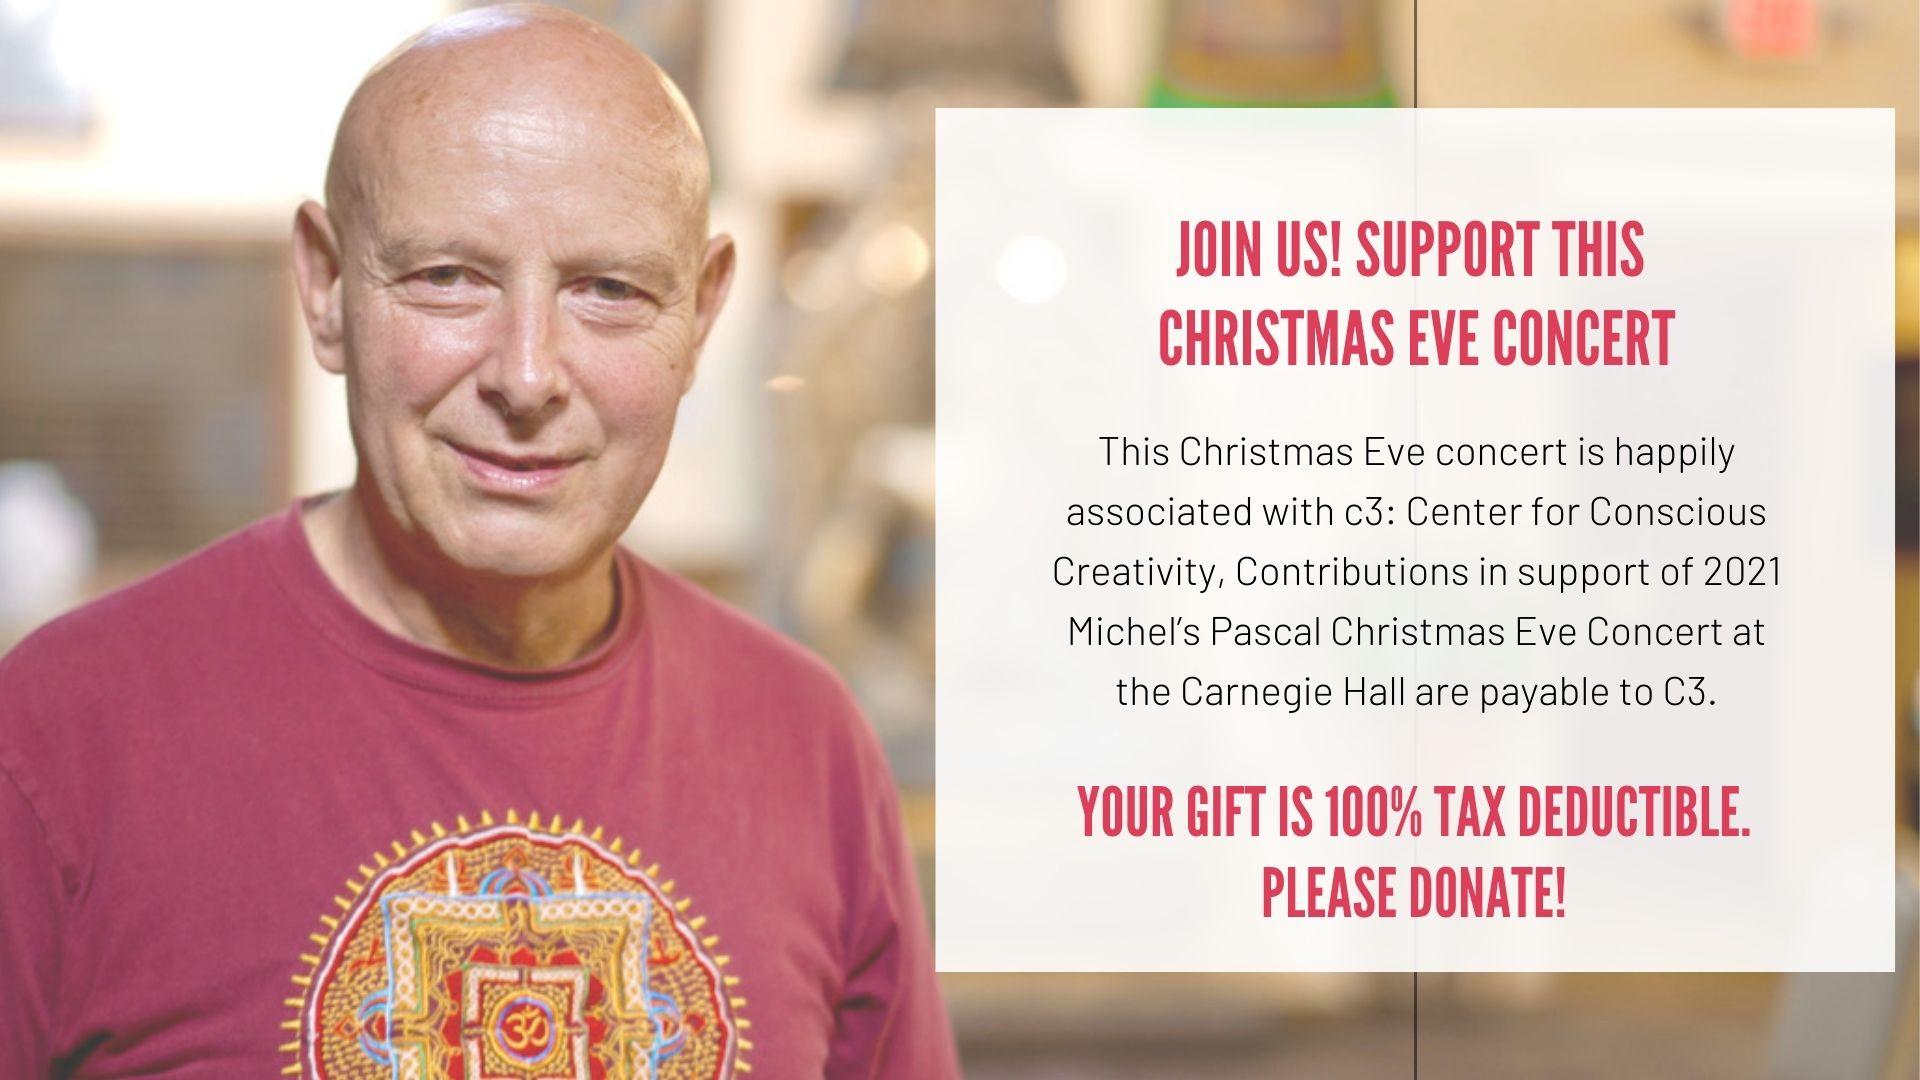 Christmas Eve Concert 2021 Michel Pascal Carnegie Hall c3 Center for Conscious Creativity